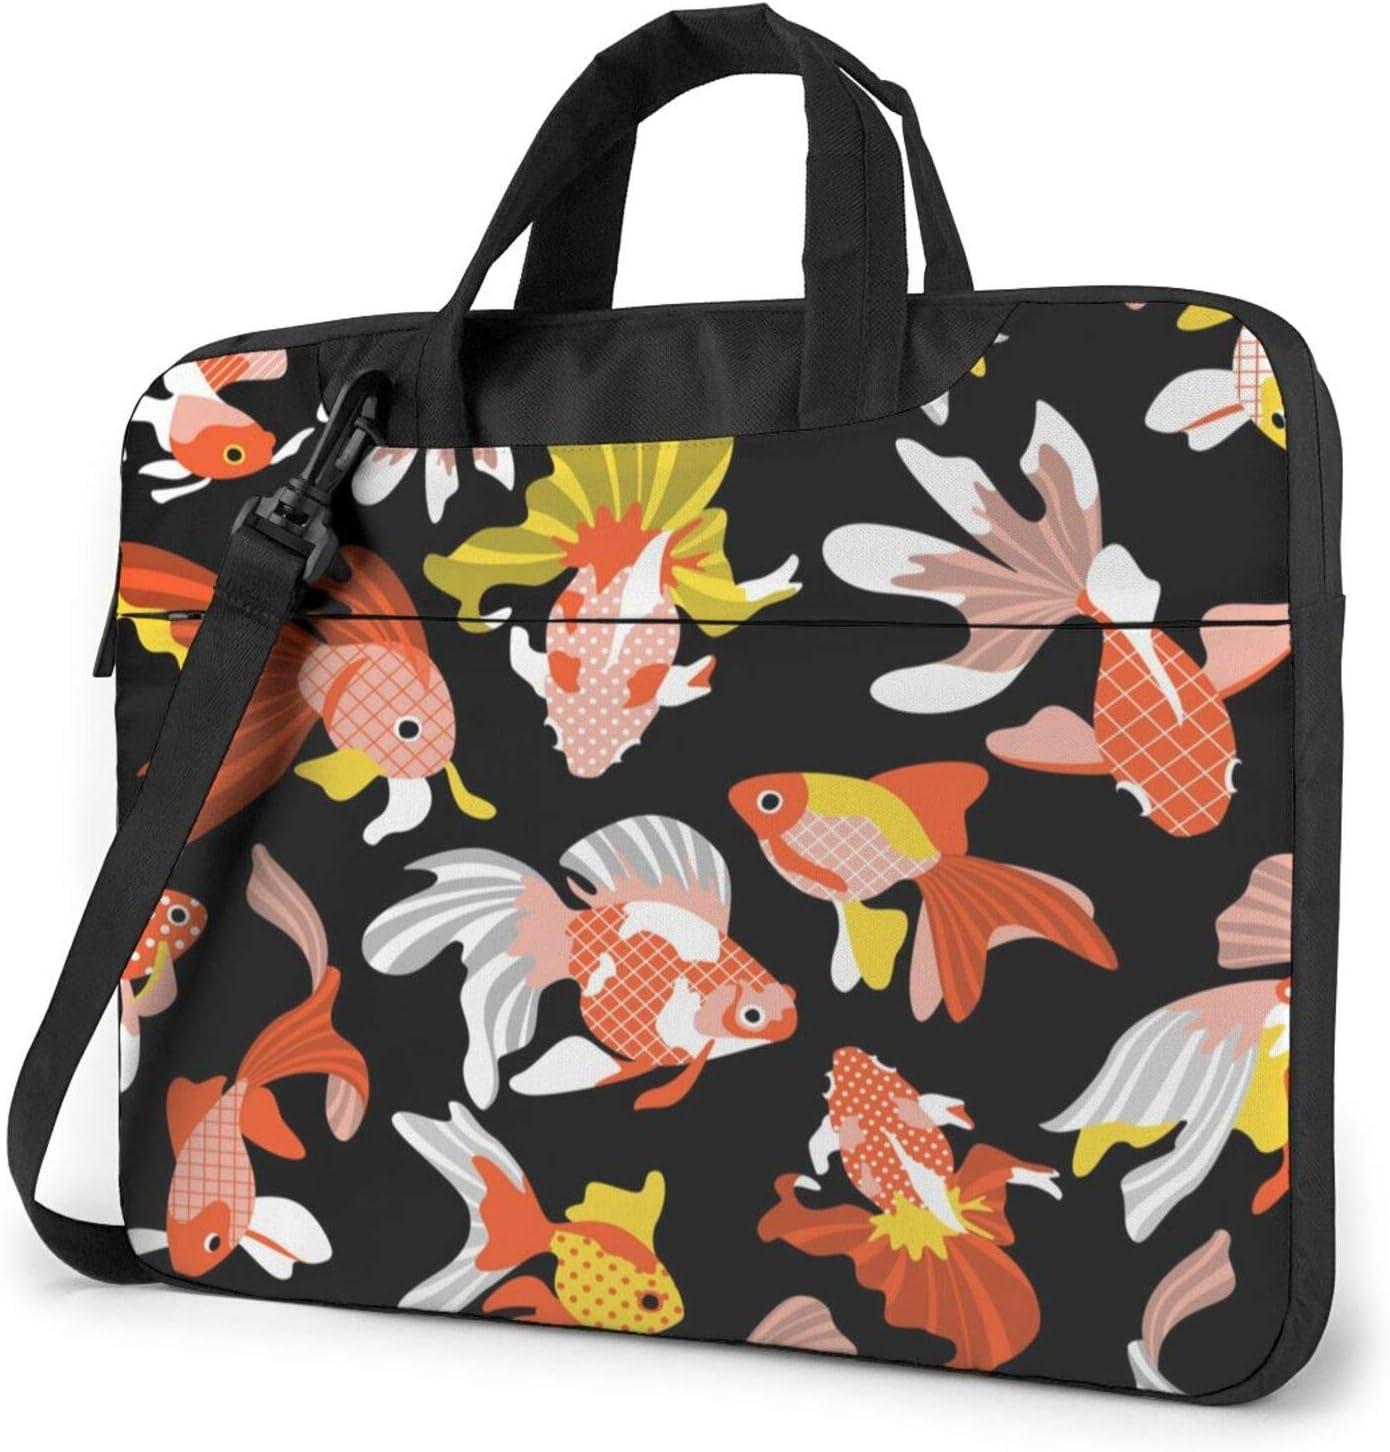 Cute Goldfishes Laptop Shoulder Messenger Bag,Laptop Shoulder Bag Carrying Case with Handle Laptop Case Laptop Briefcase 15.6 Inch Fits 14 15 15.6 inch Netbook/Laptop